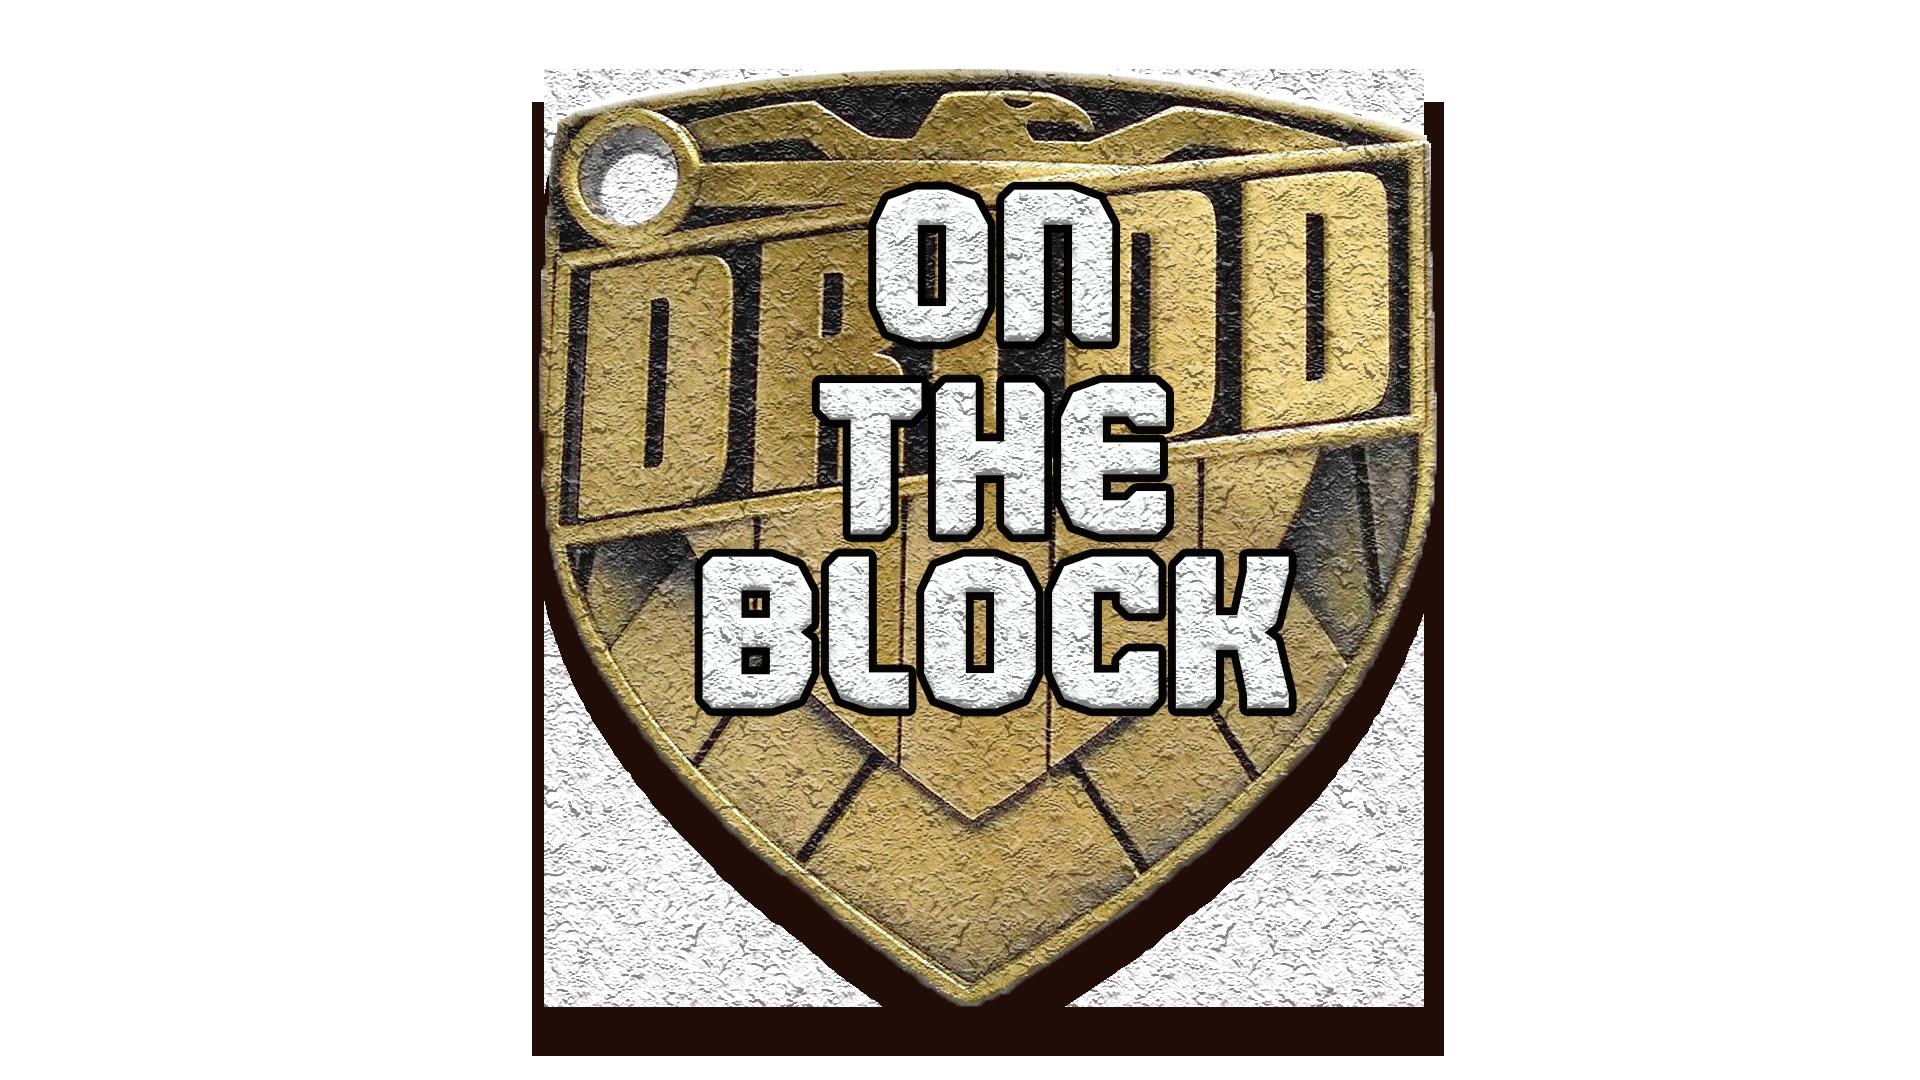 Episode 3 - Judge Dredd: On The Block show art